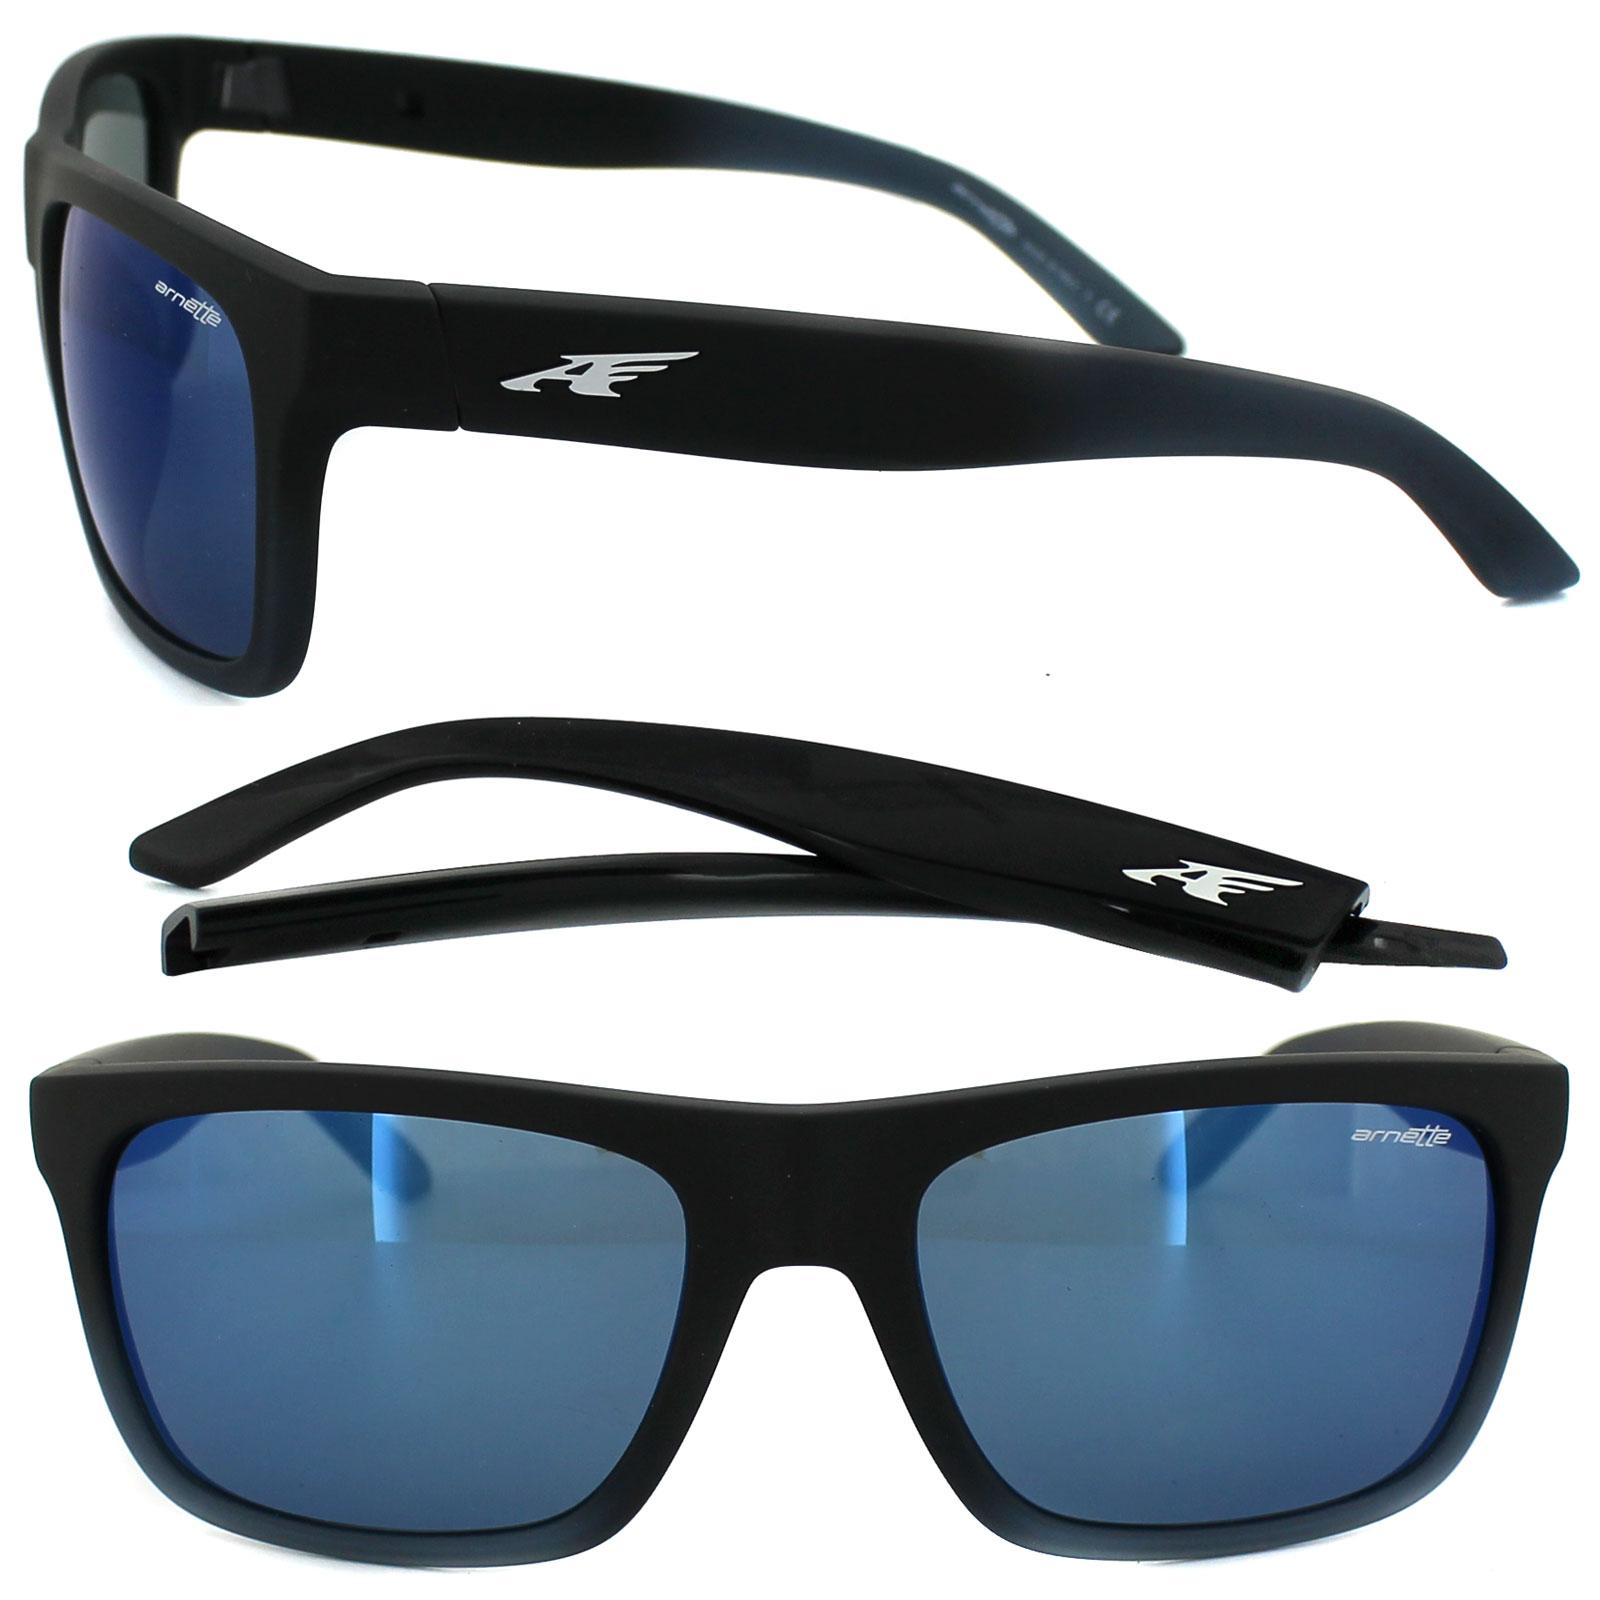 bb03989e4f Sentinel Arnette Sunglasses 4176 Dropout 225455 Fuzzy Black Fade to  Blueberry Blue Mirror